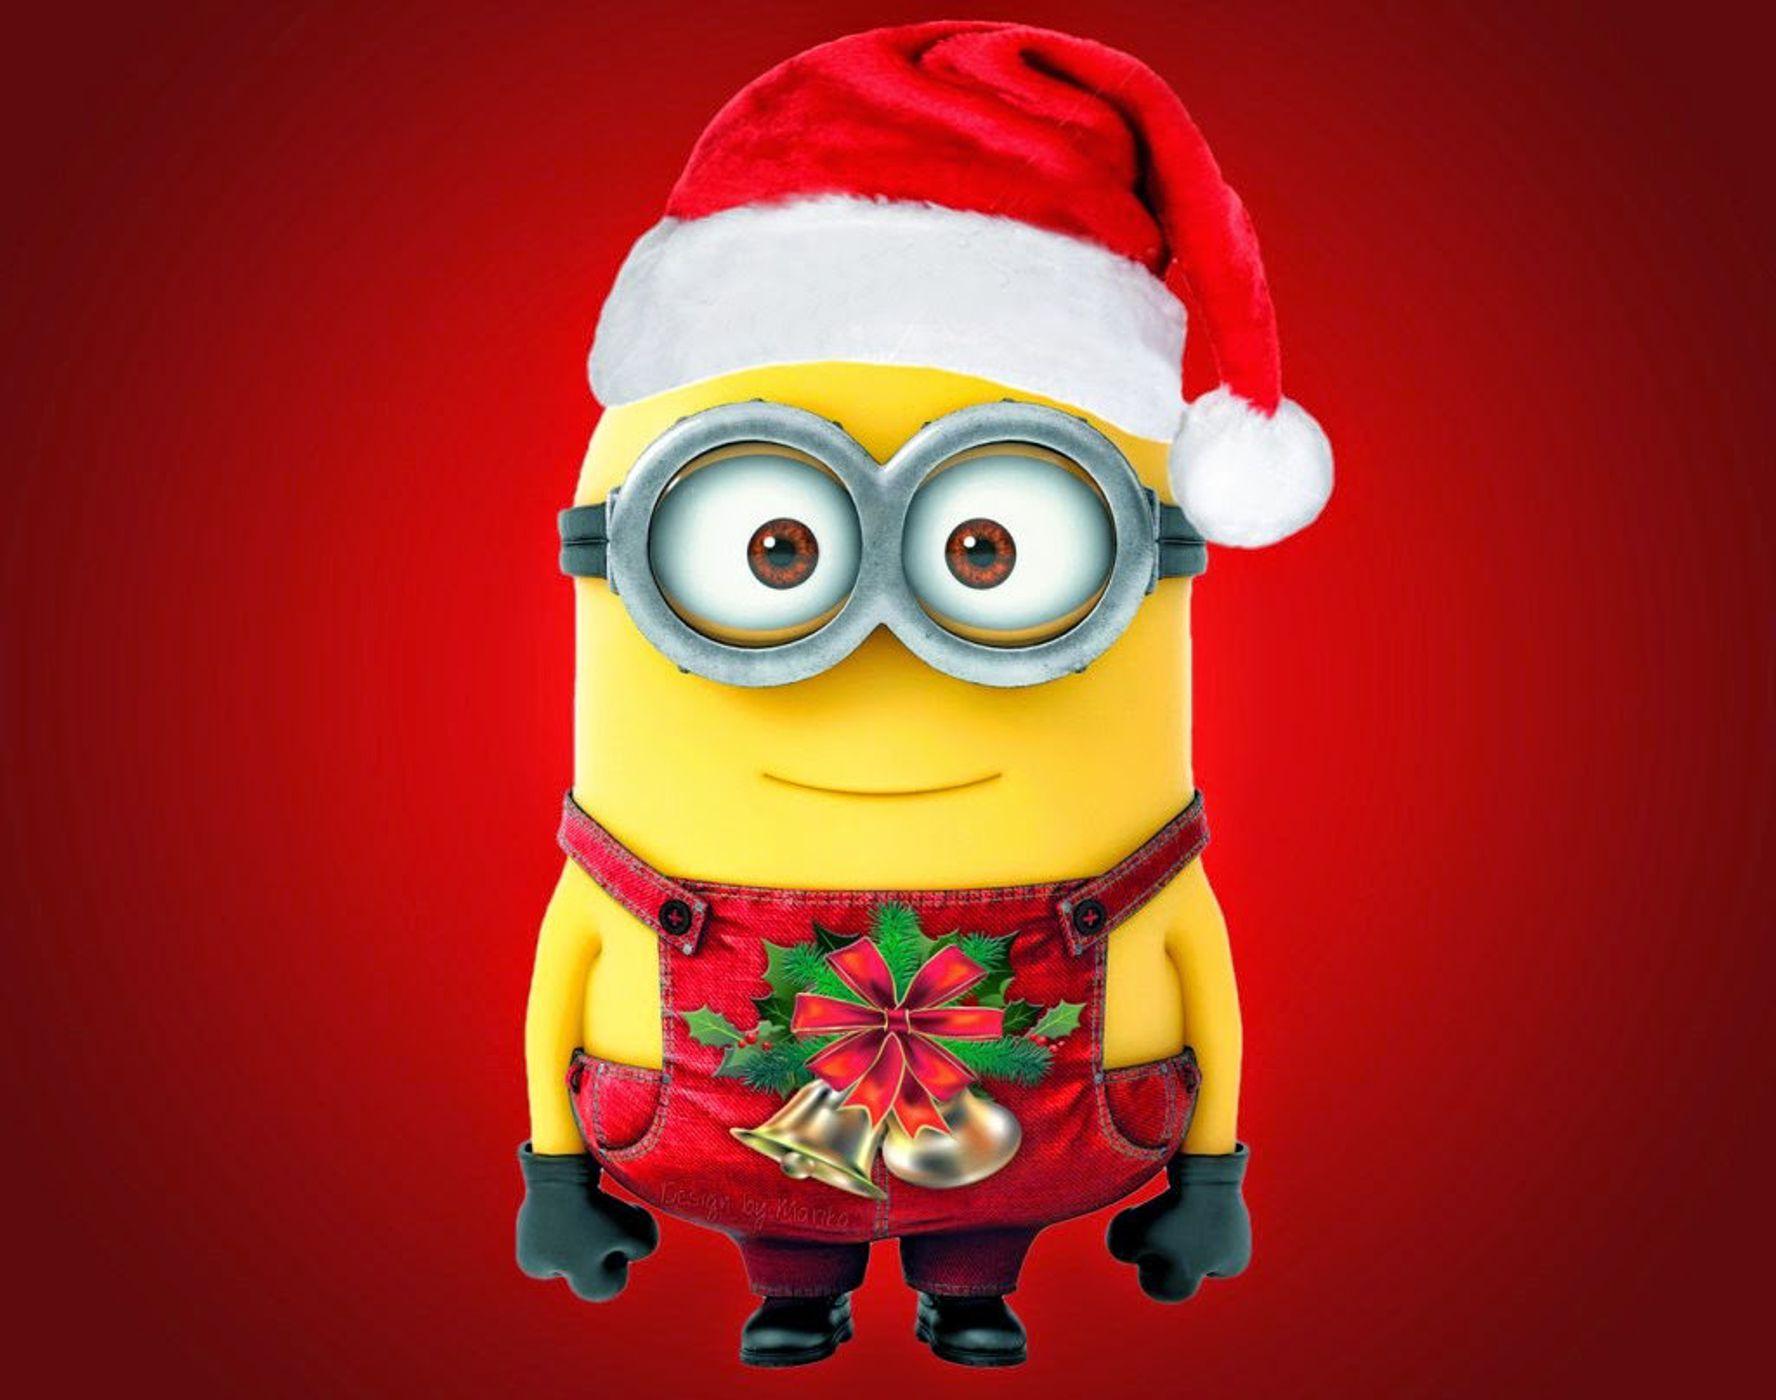 minions singing jingle bell merry christmas 2014 - Minions Christmas Song